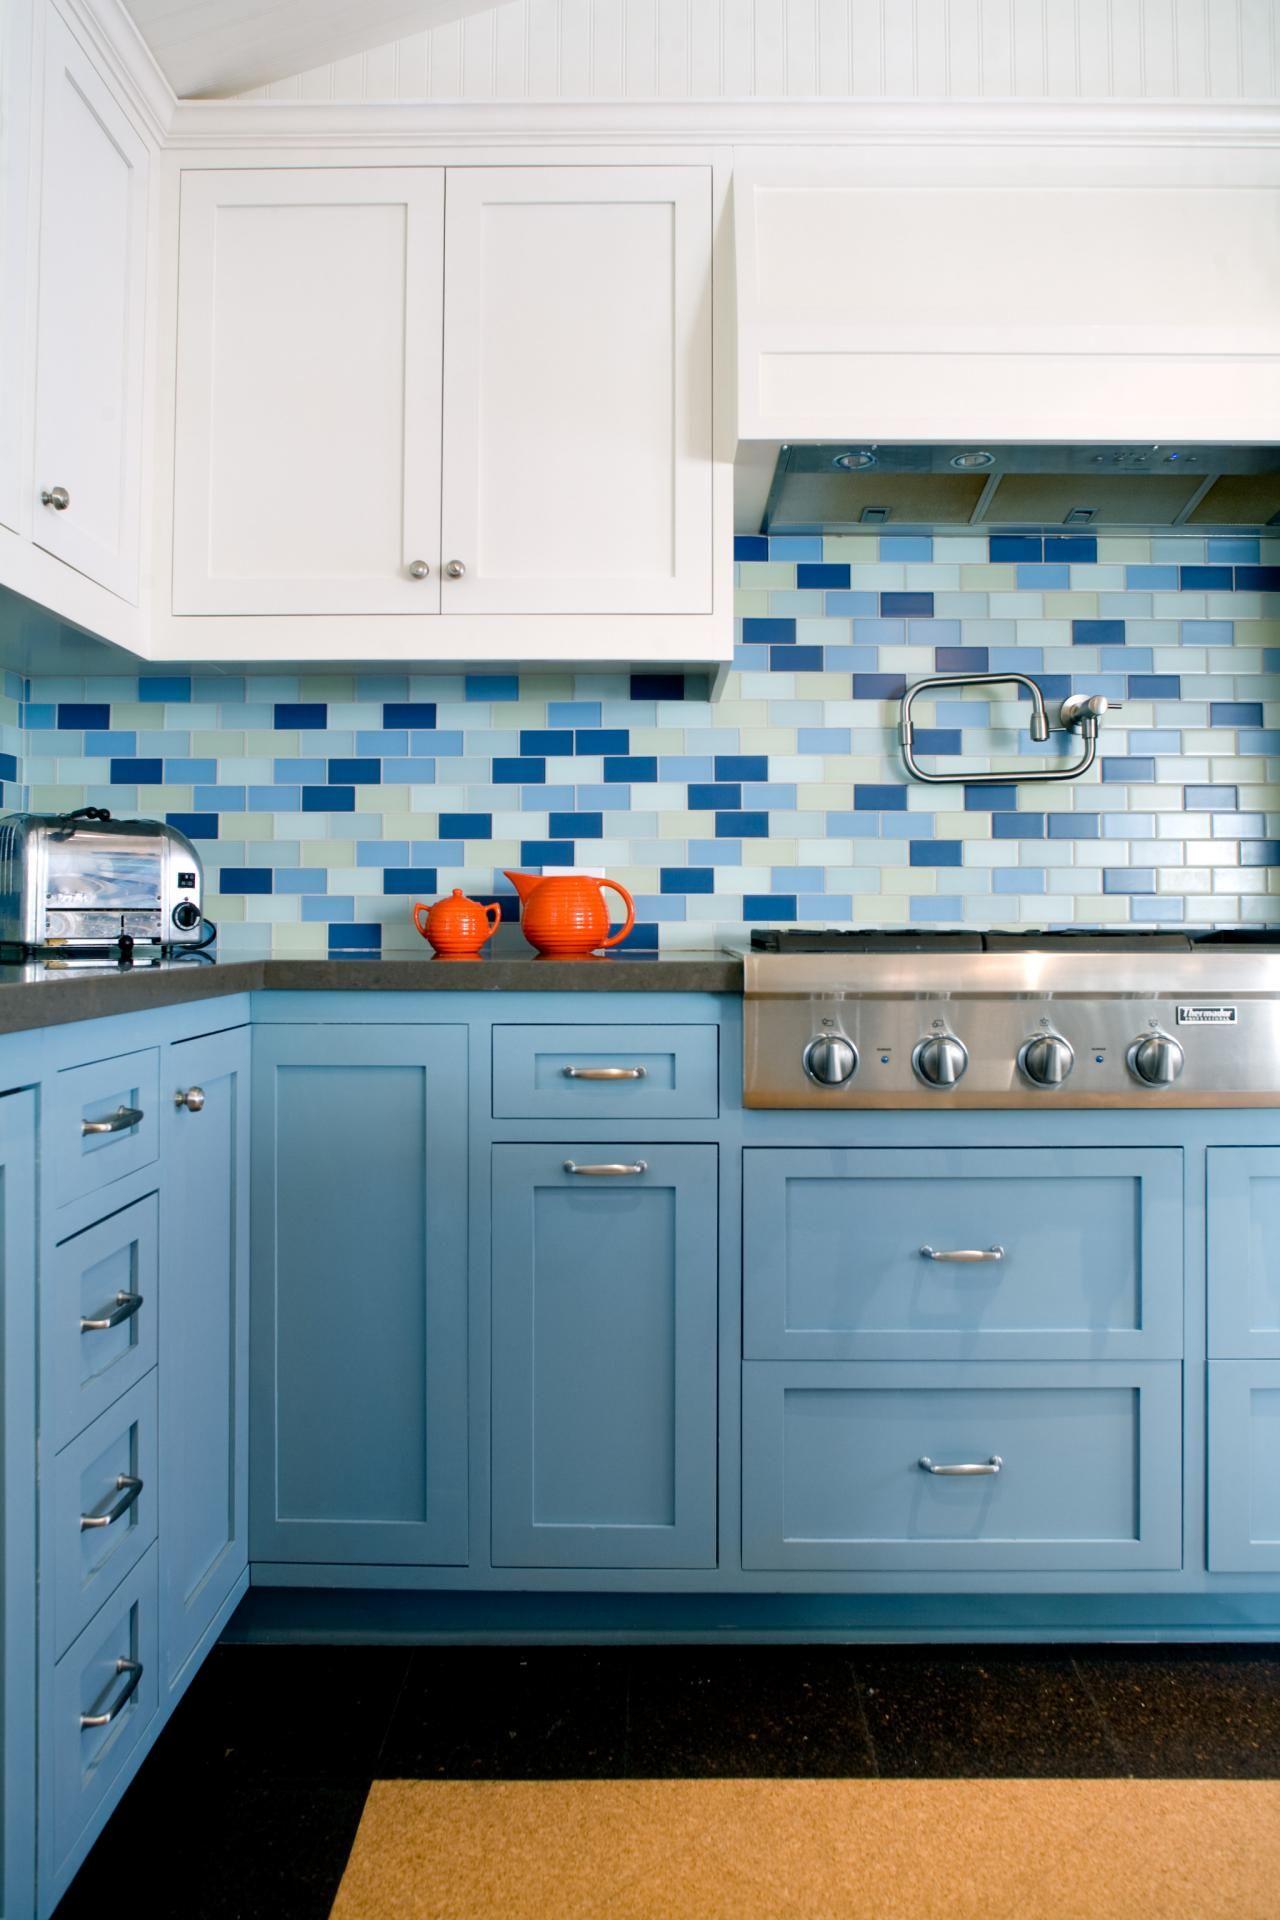 11 Creative Subway Tile Backsplash Ideas | Subway tile backsplash ...